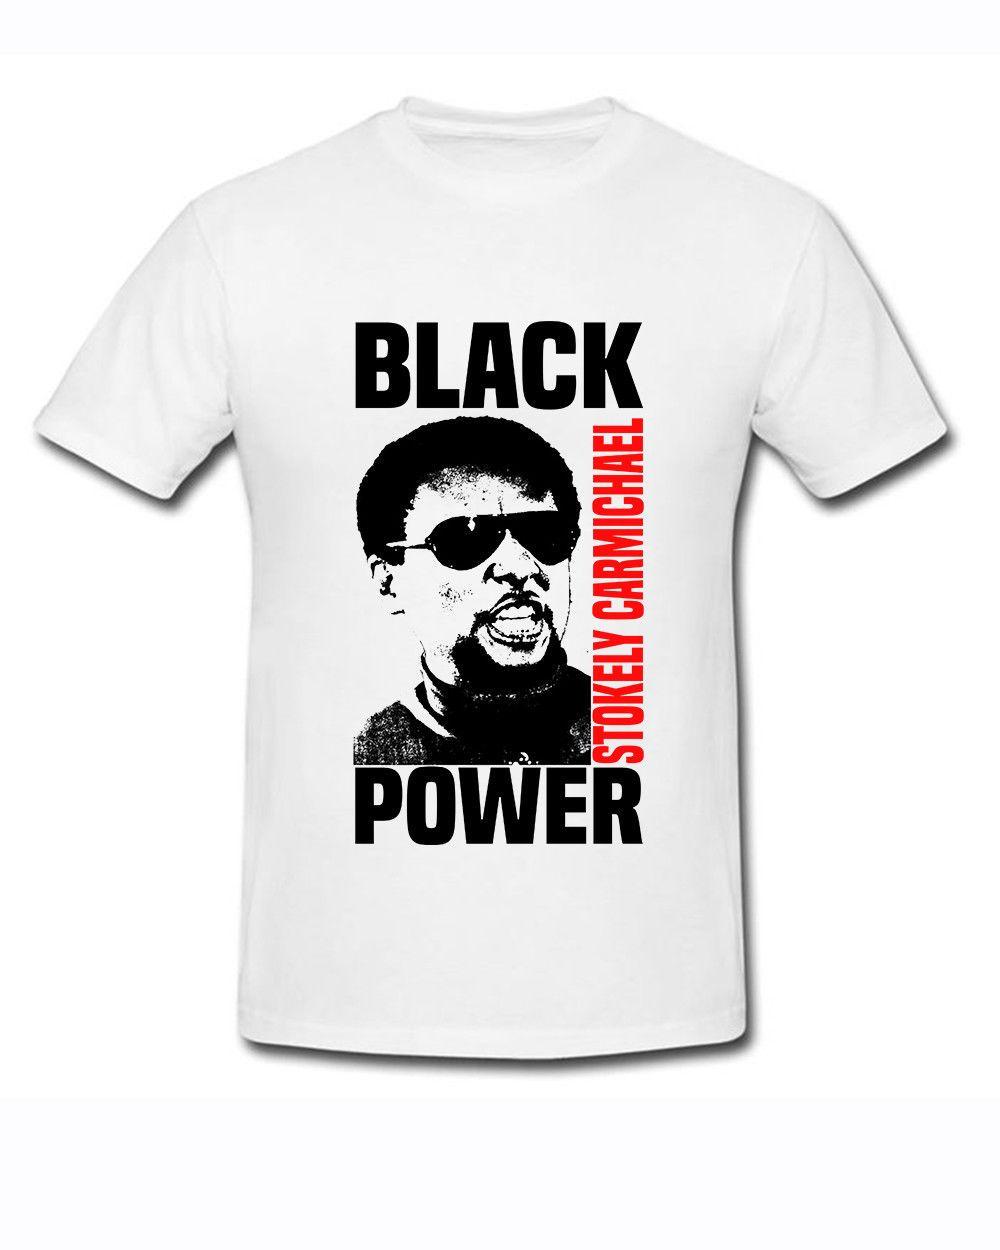 fae51831c Stokely Carmichael-Black Power white Men T-shirt size S-2XL